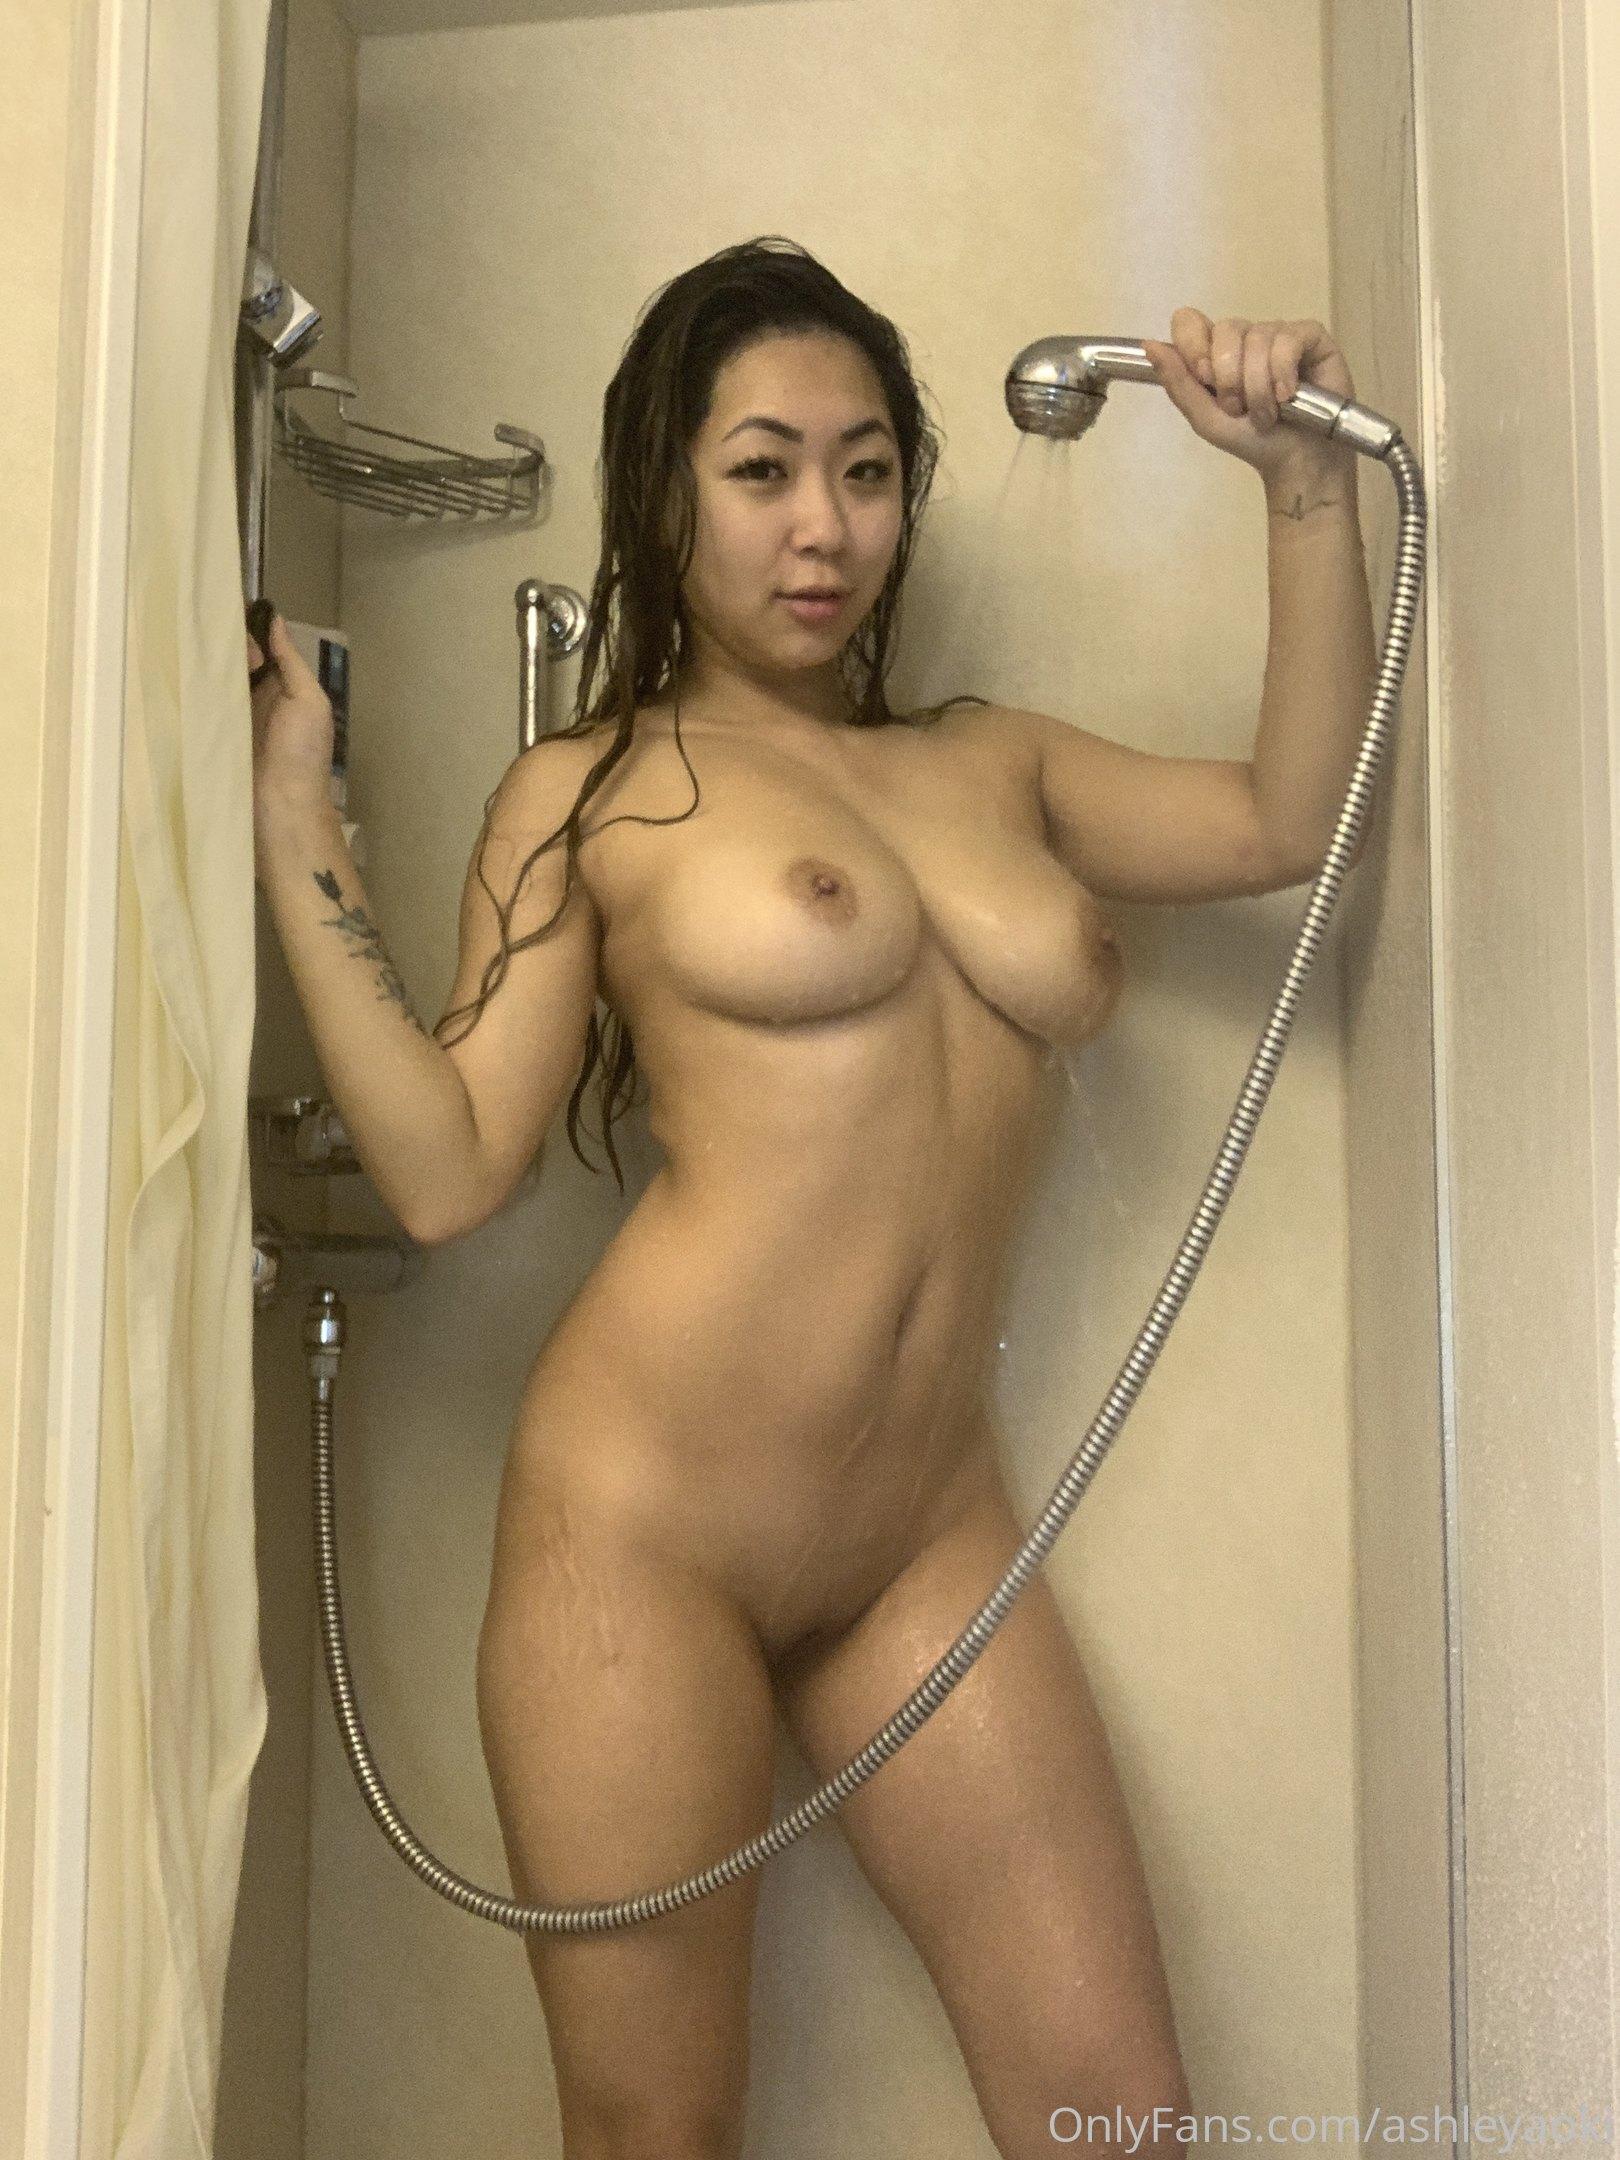 Ashley Aoki, Ashleyaoki, Onlyfans Leaks 0231